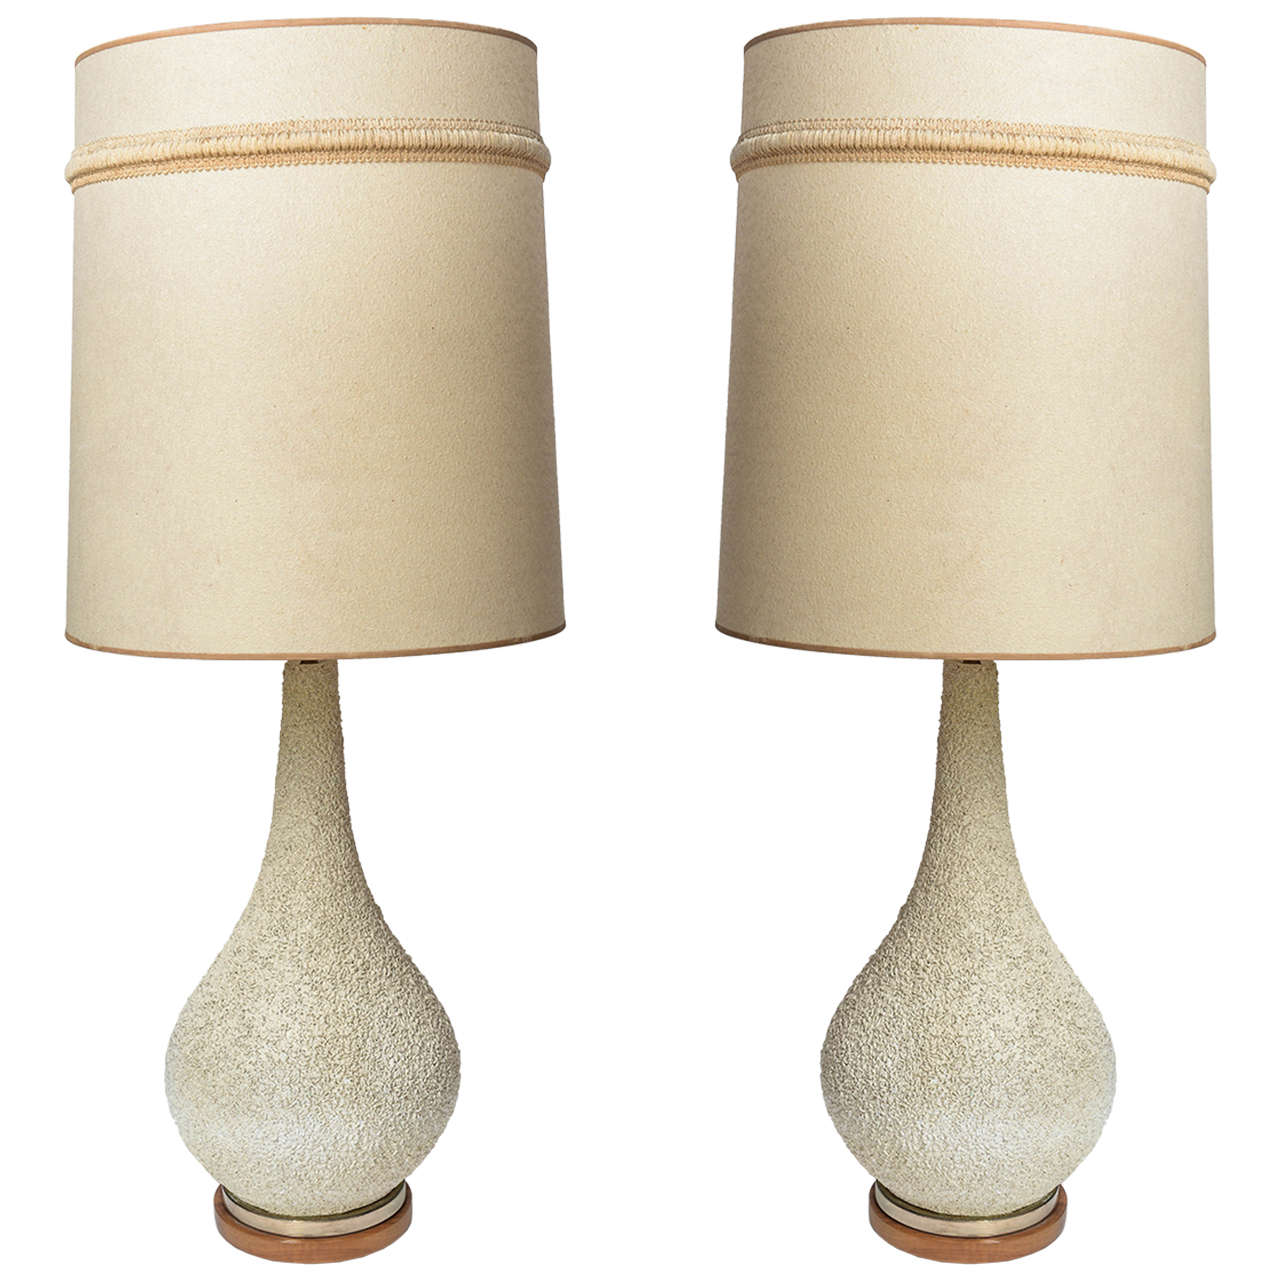 tall pair of midcentury modern danish style pottery textured  - tall pair of midcentury modern danish style pottery textured lamps